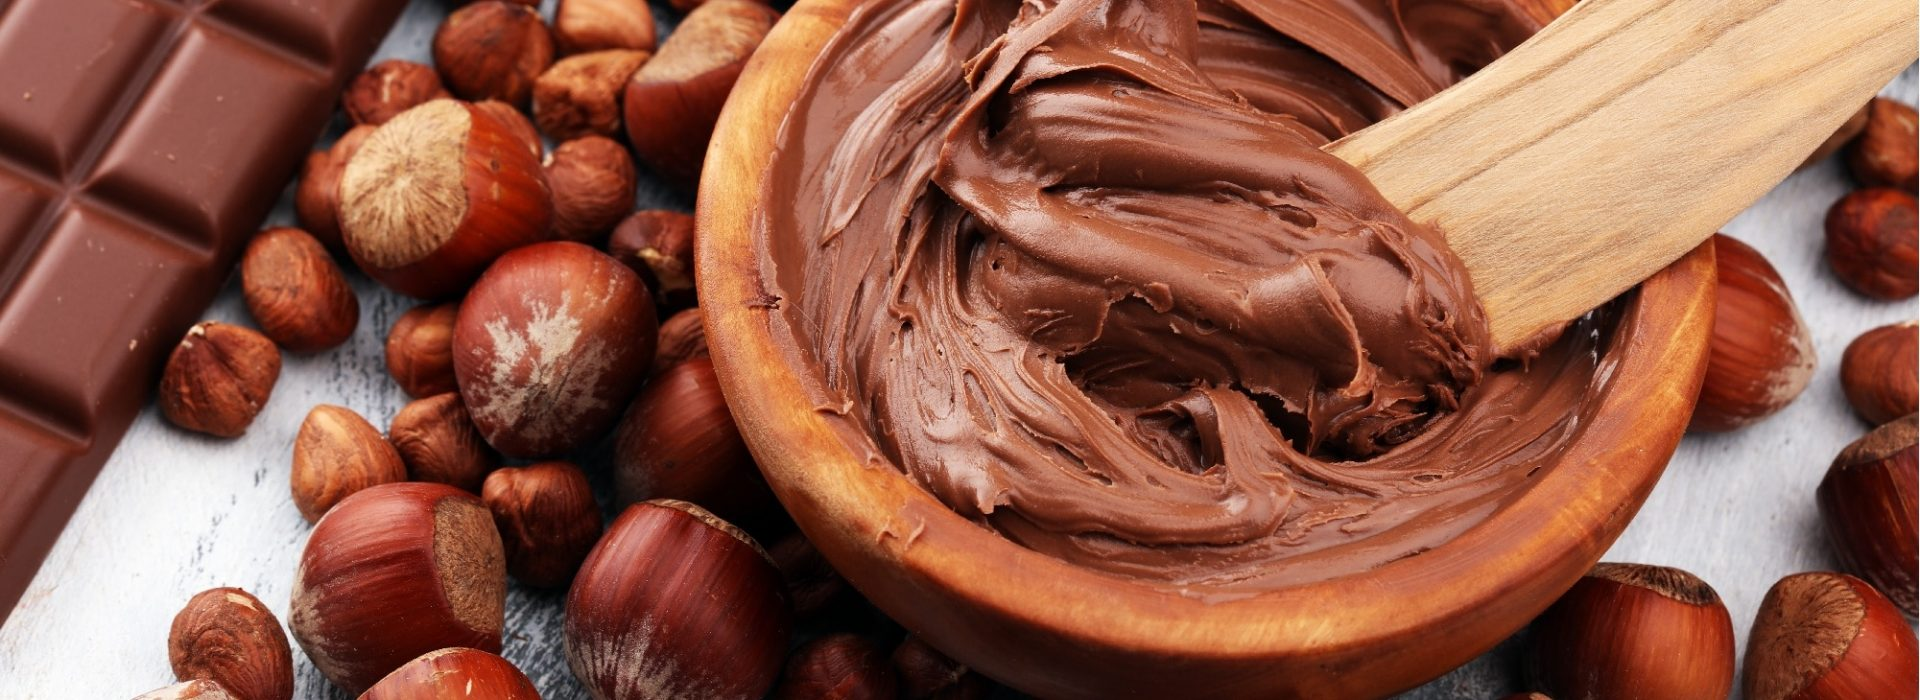 Nutella Day Blog Image. Image du blog jour du nutella.